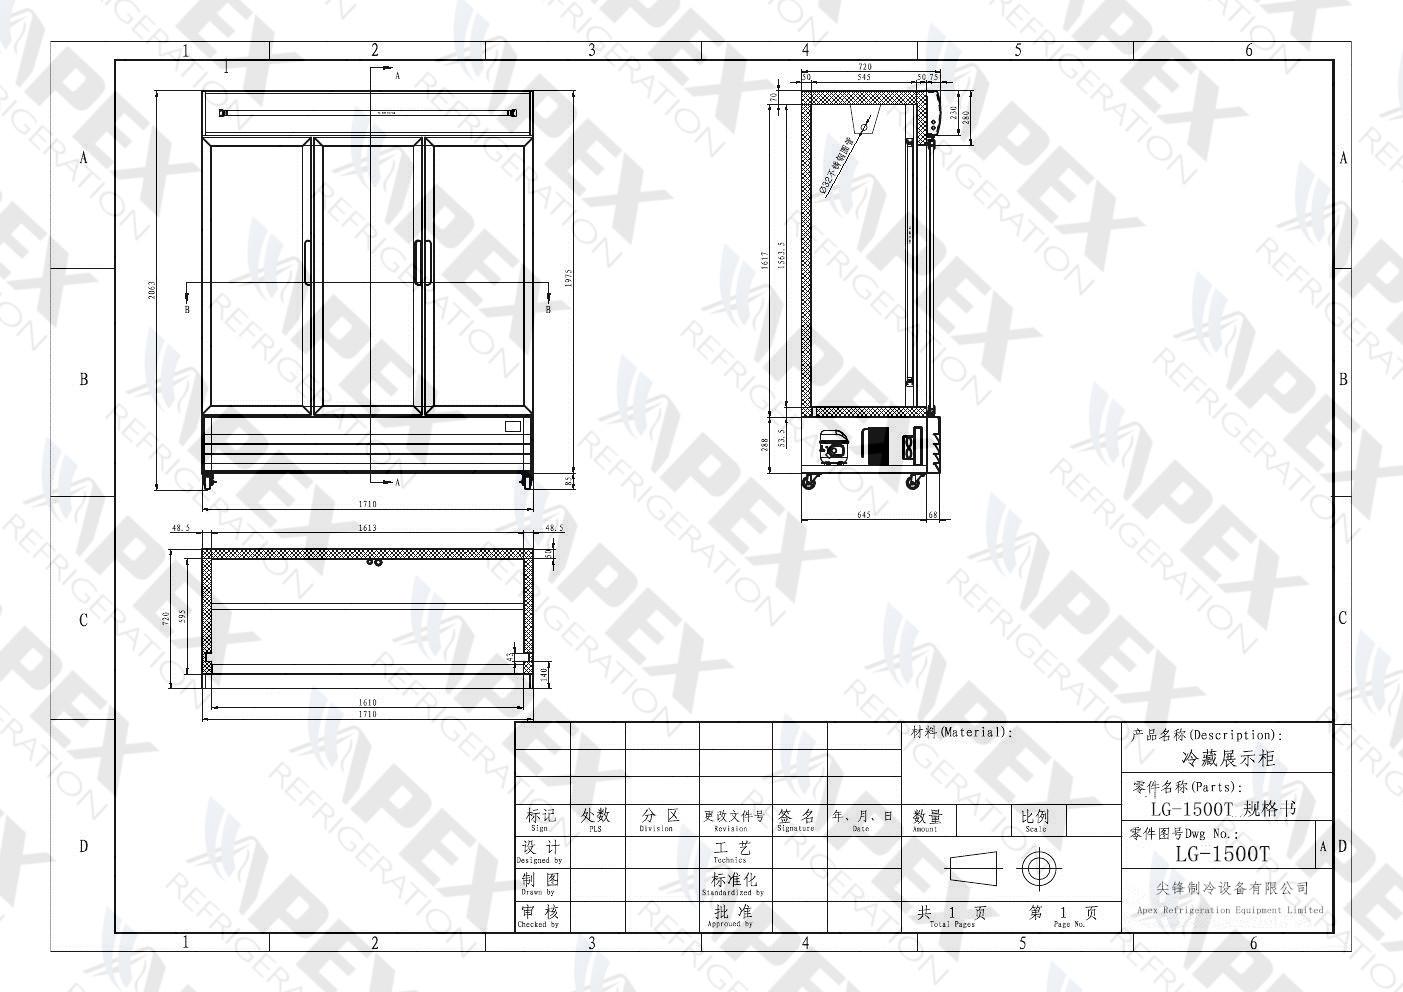 Tripe Doors Upright Cooler LG-1500t/LG-2000t